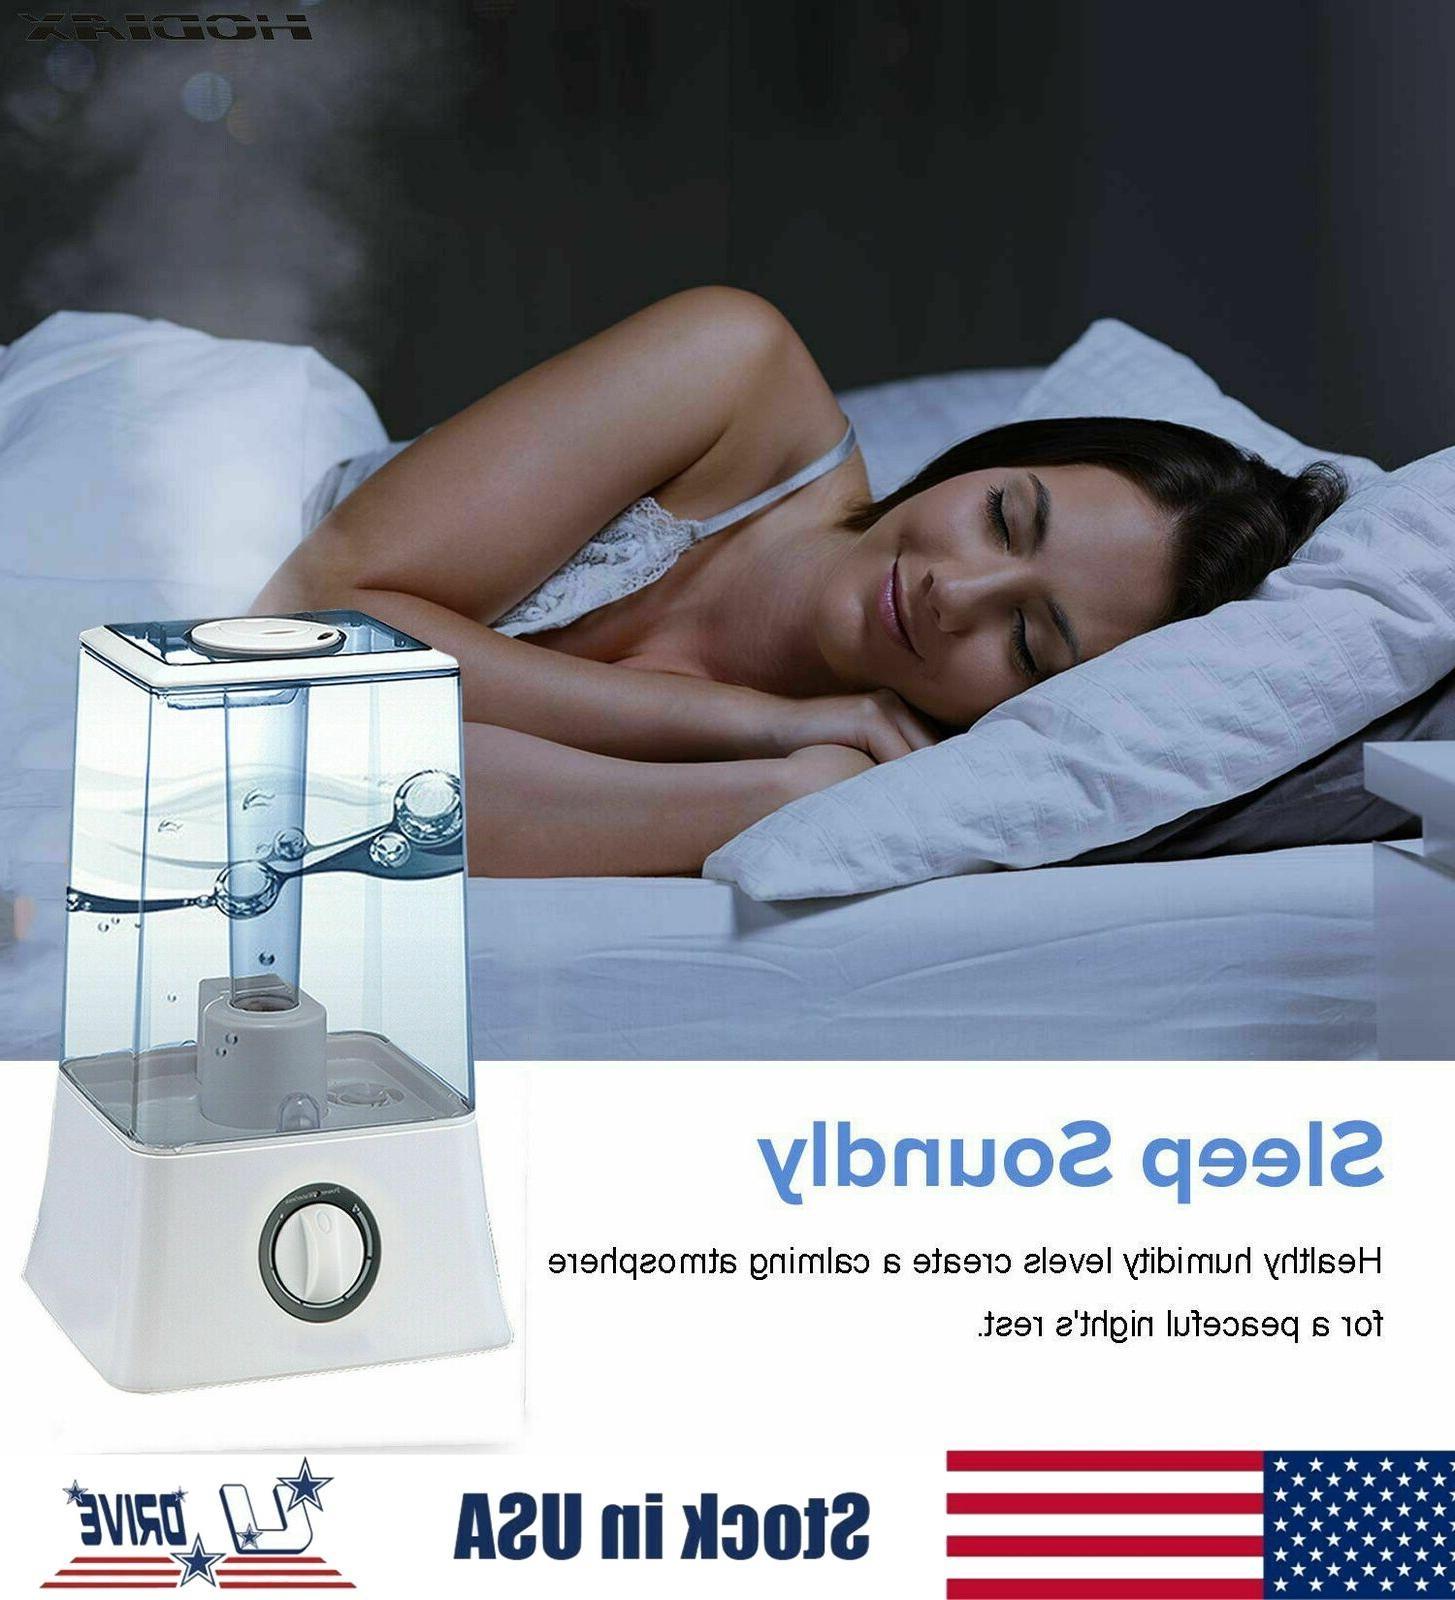 4.5L Air Ultrasonic Humidifier